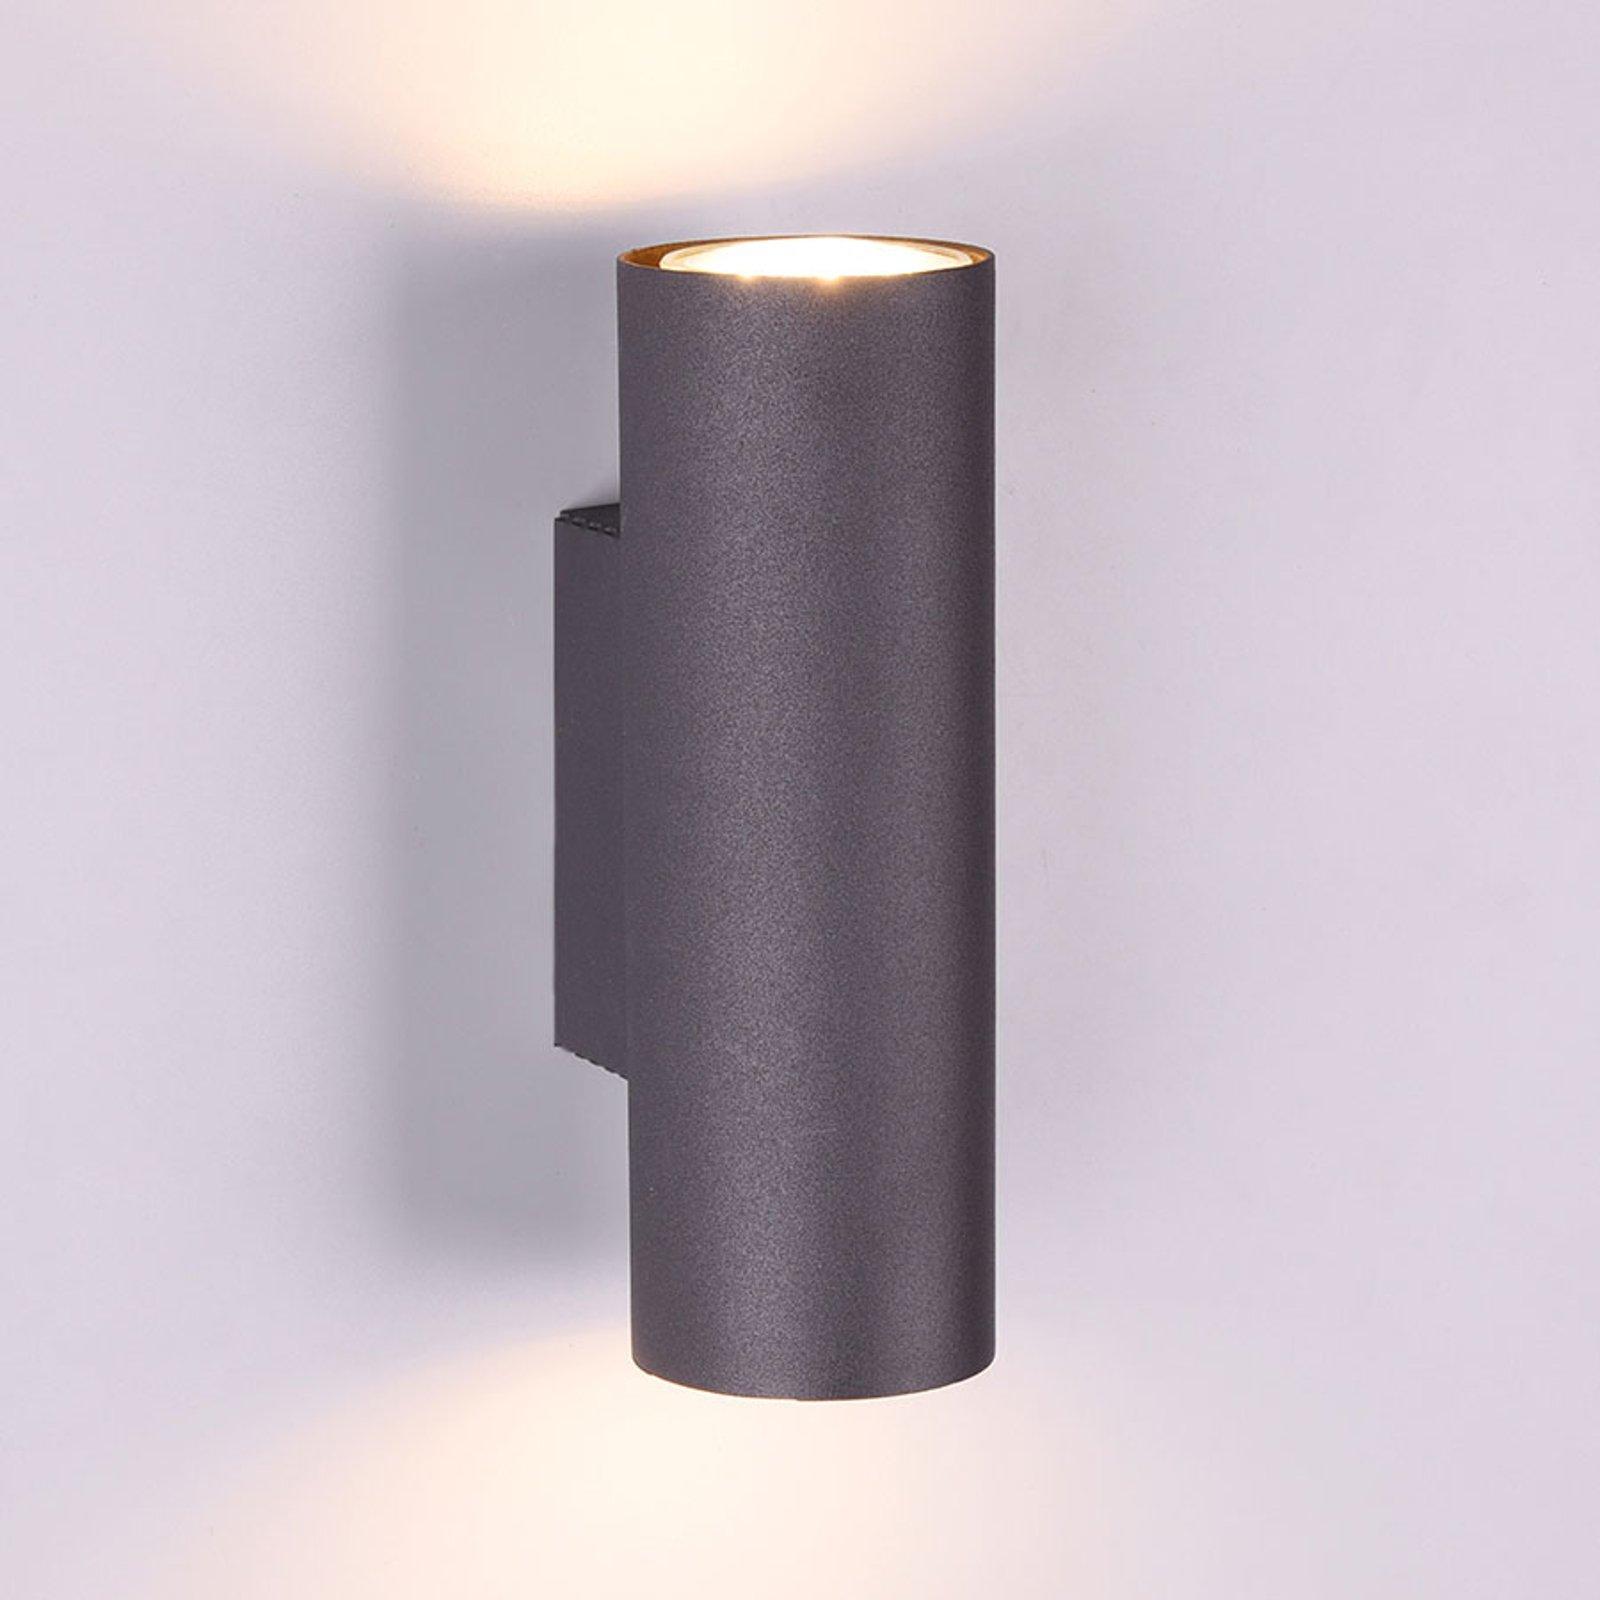 Vegglampe Marley 2 lyskilder svart